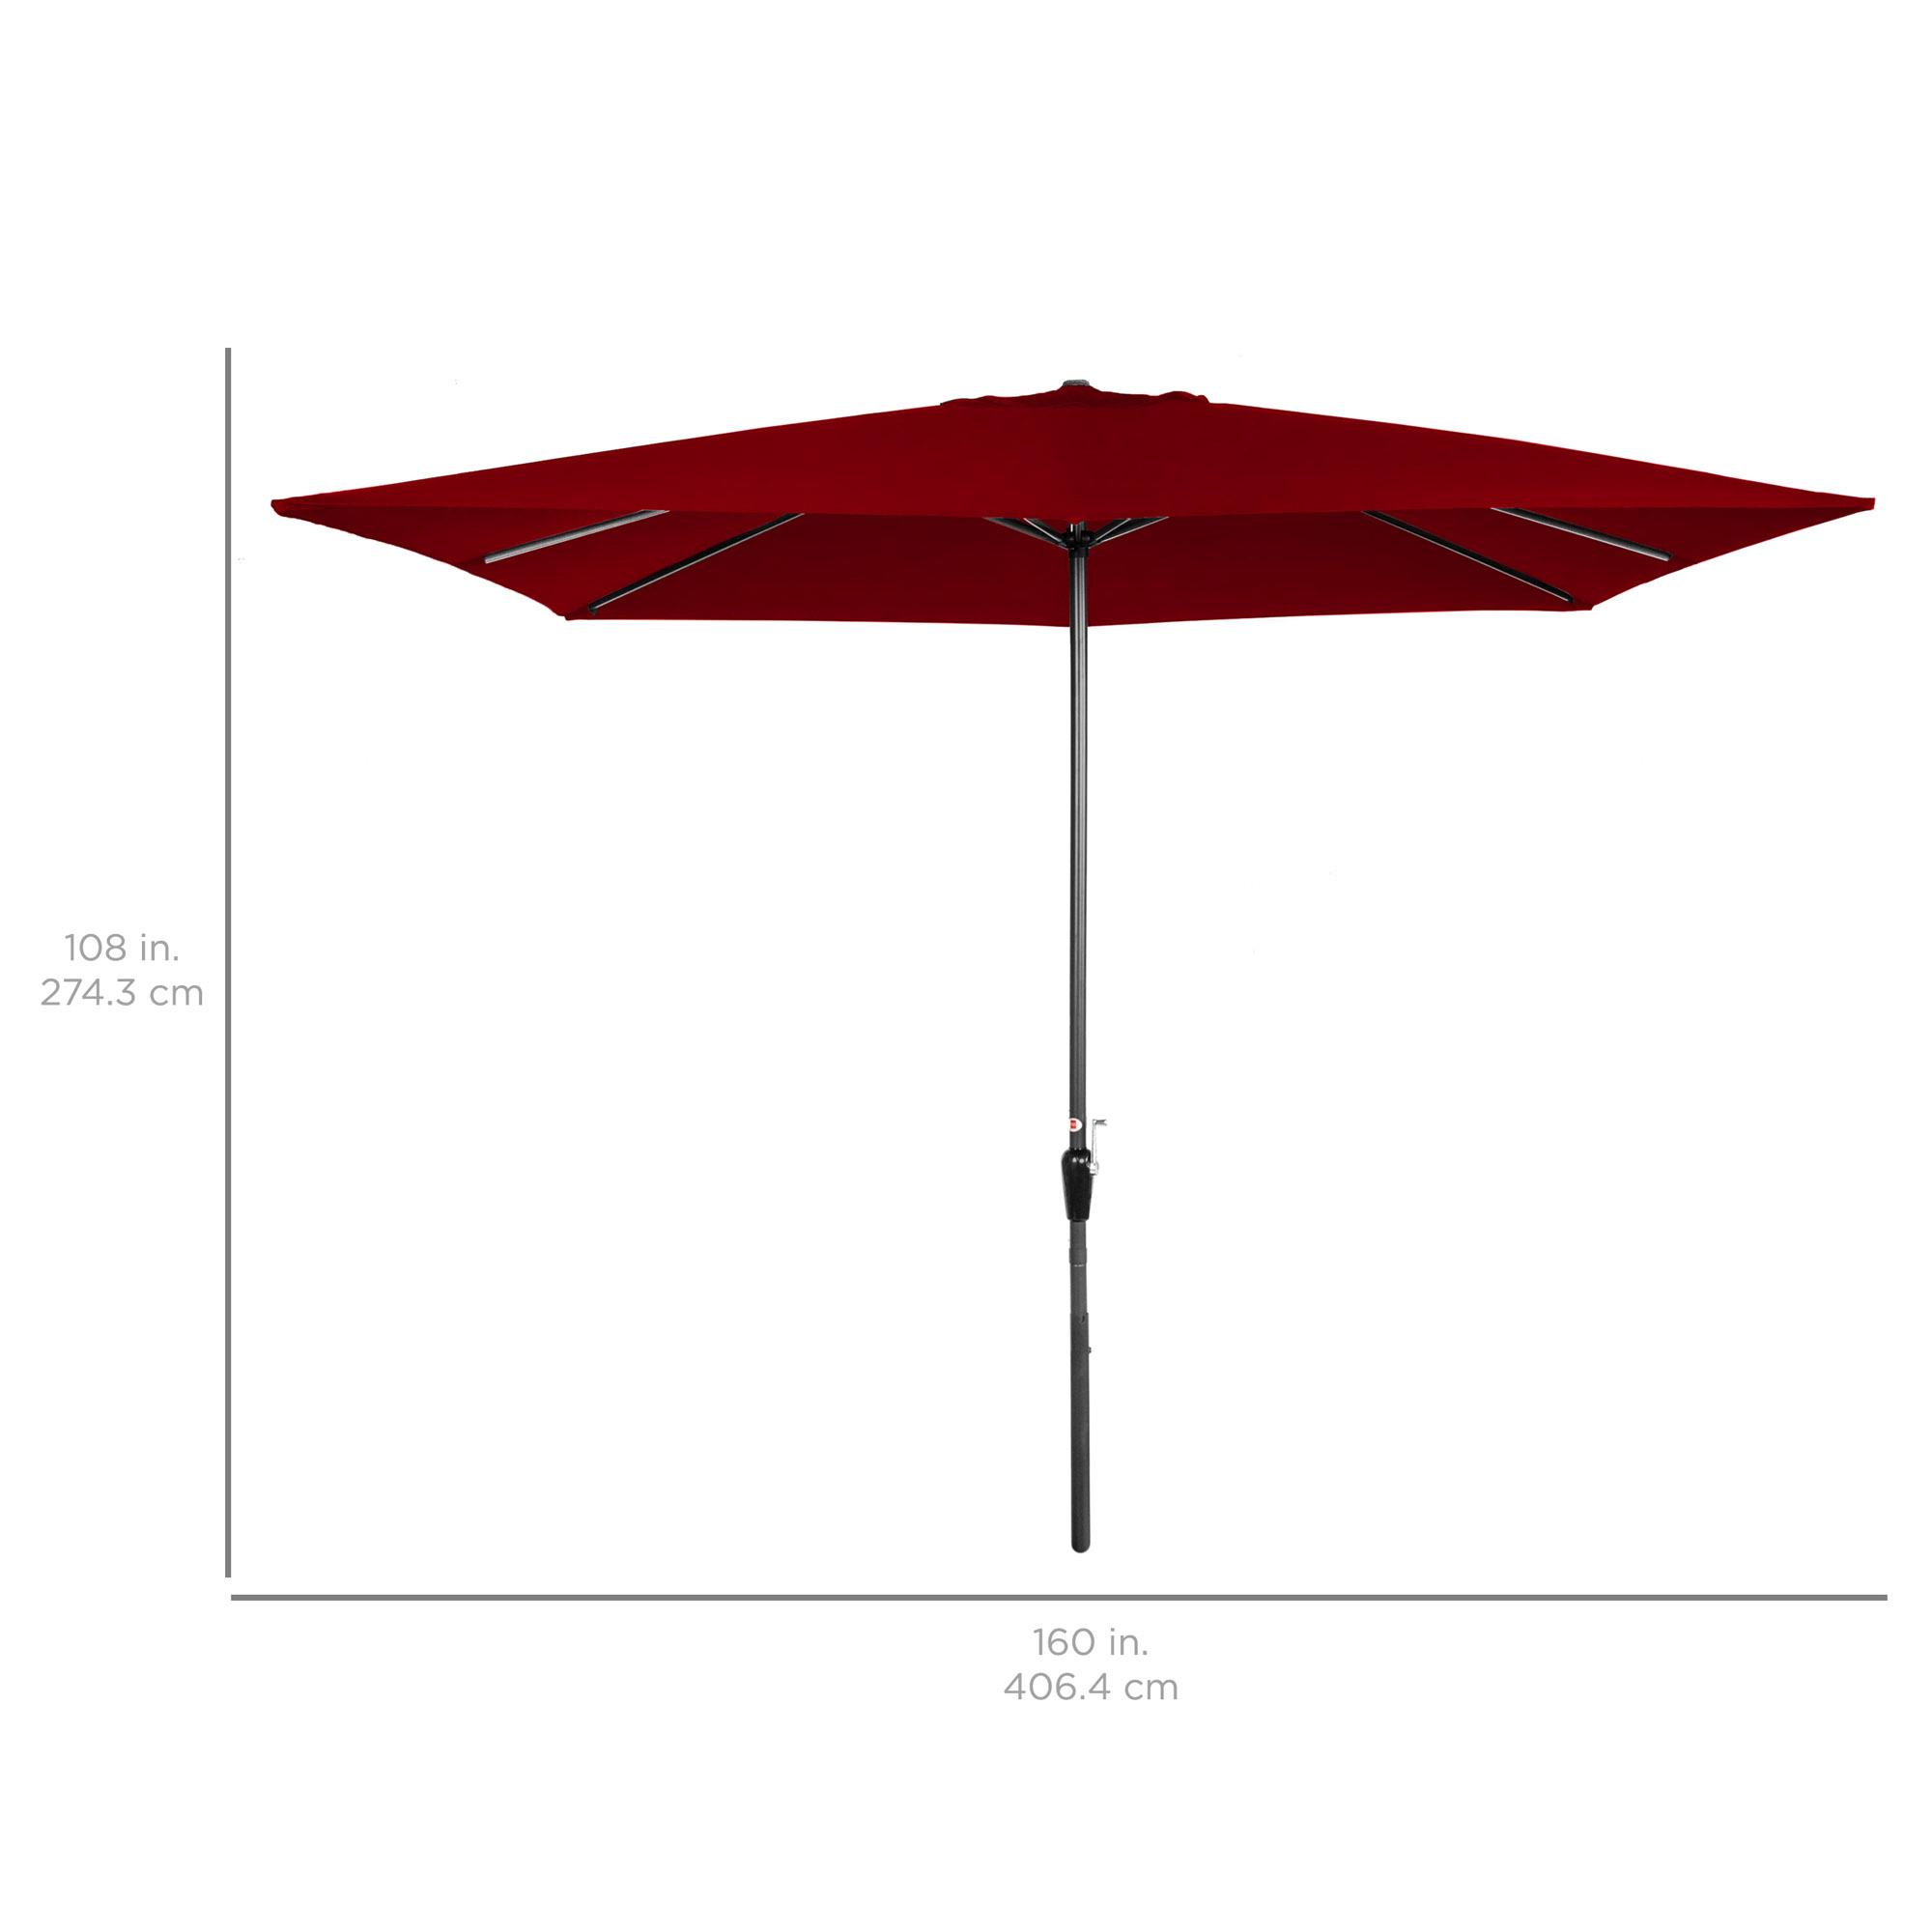 BCP-8x11ft-Rectangular-Patio-Umbrella-w-Easy-Crank-UV-Resistant-Fabric thumbnail 7